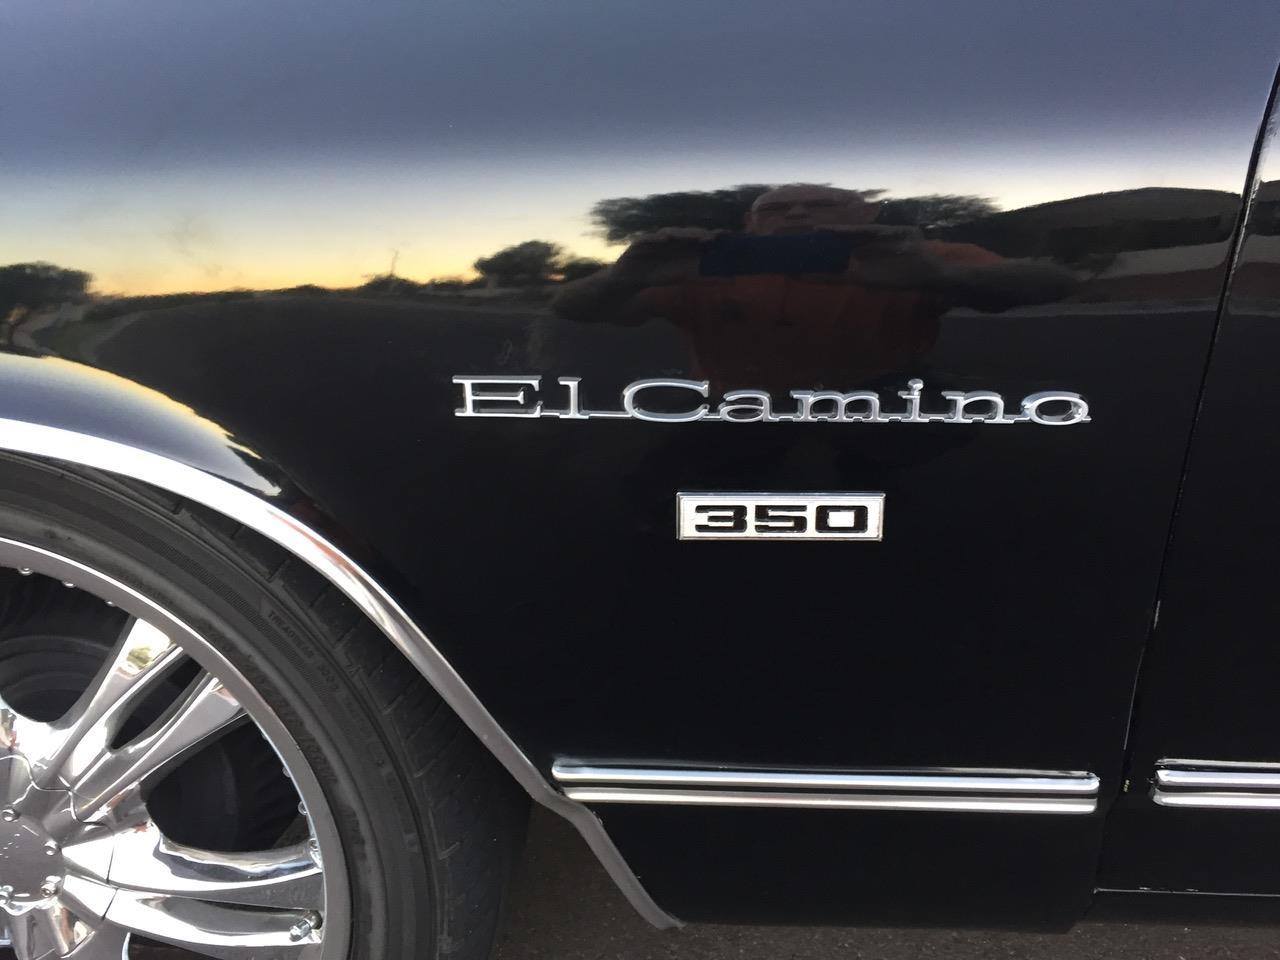 Large Picture of Classic '72 Chevrolet El Camino located in Riverton Utah - $15,000.00 - L5WP